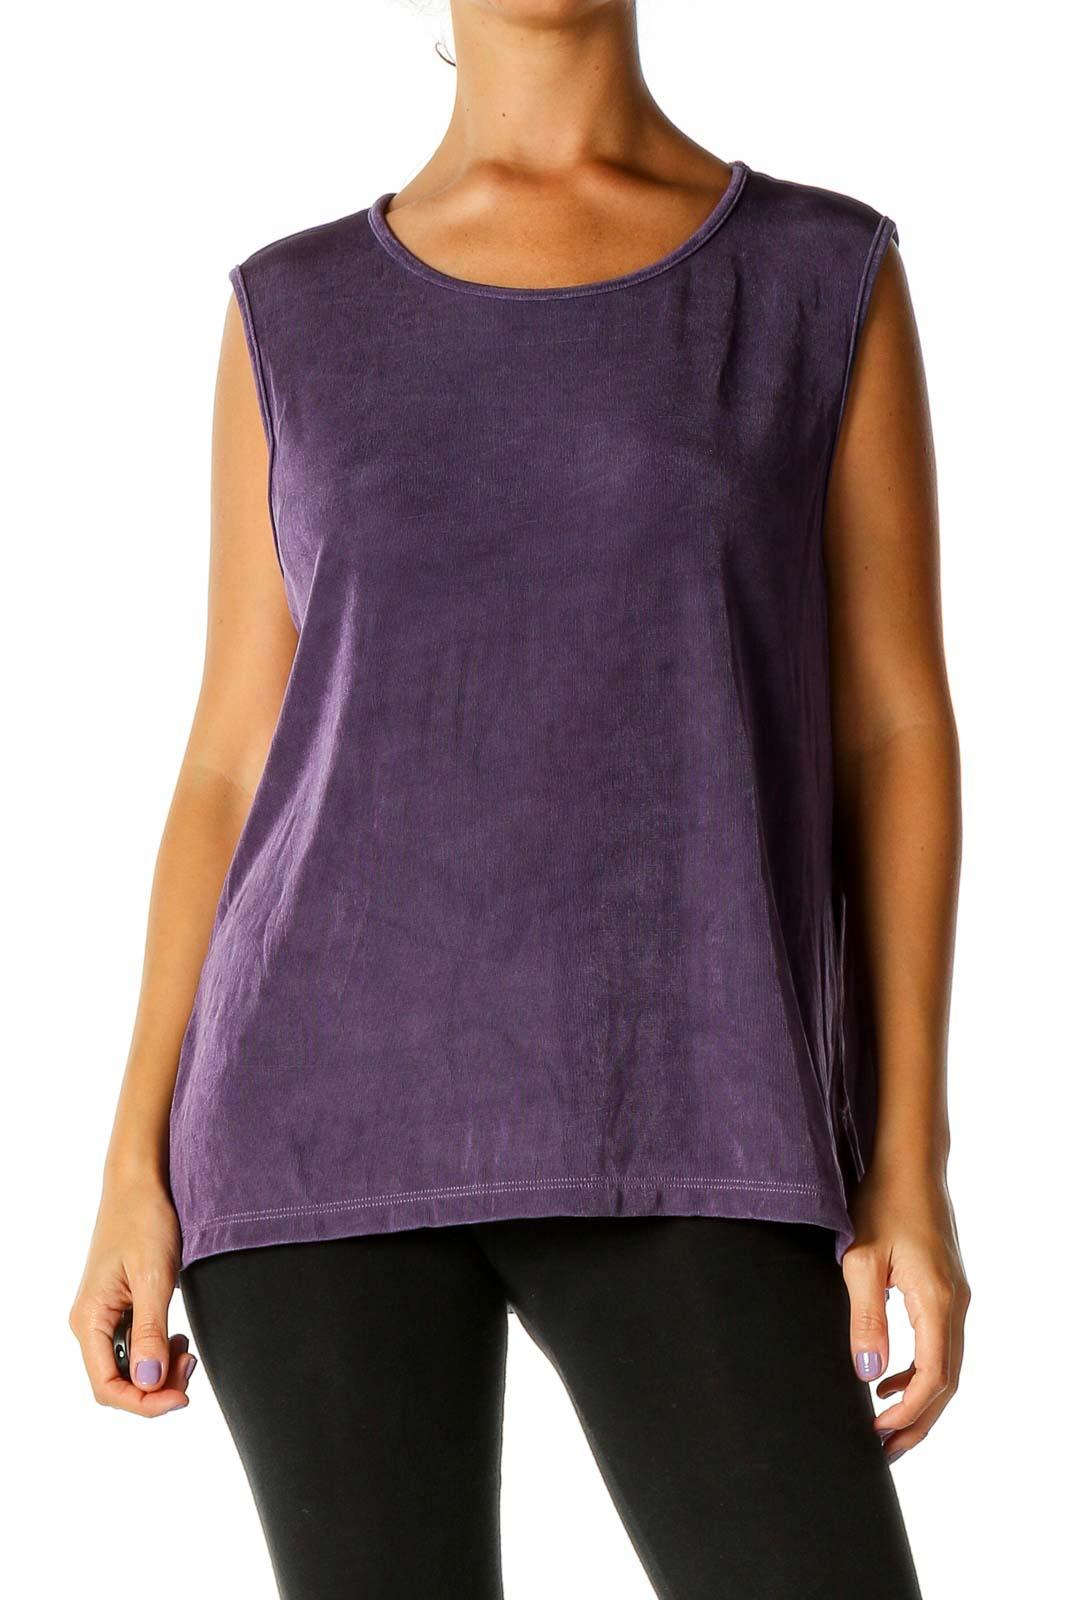 Purple Solid Retro Blouse Front